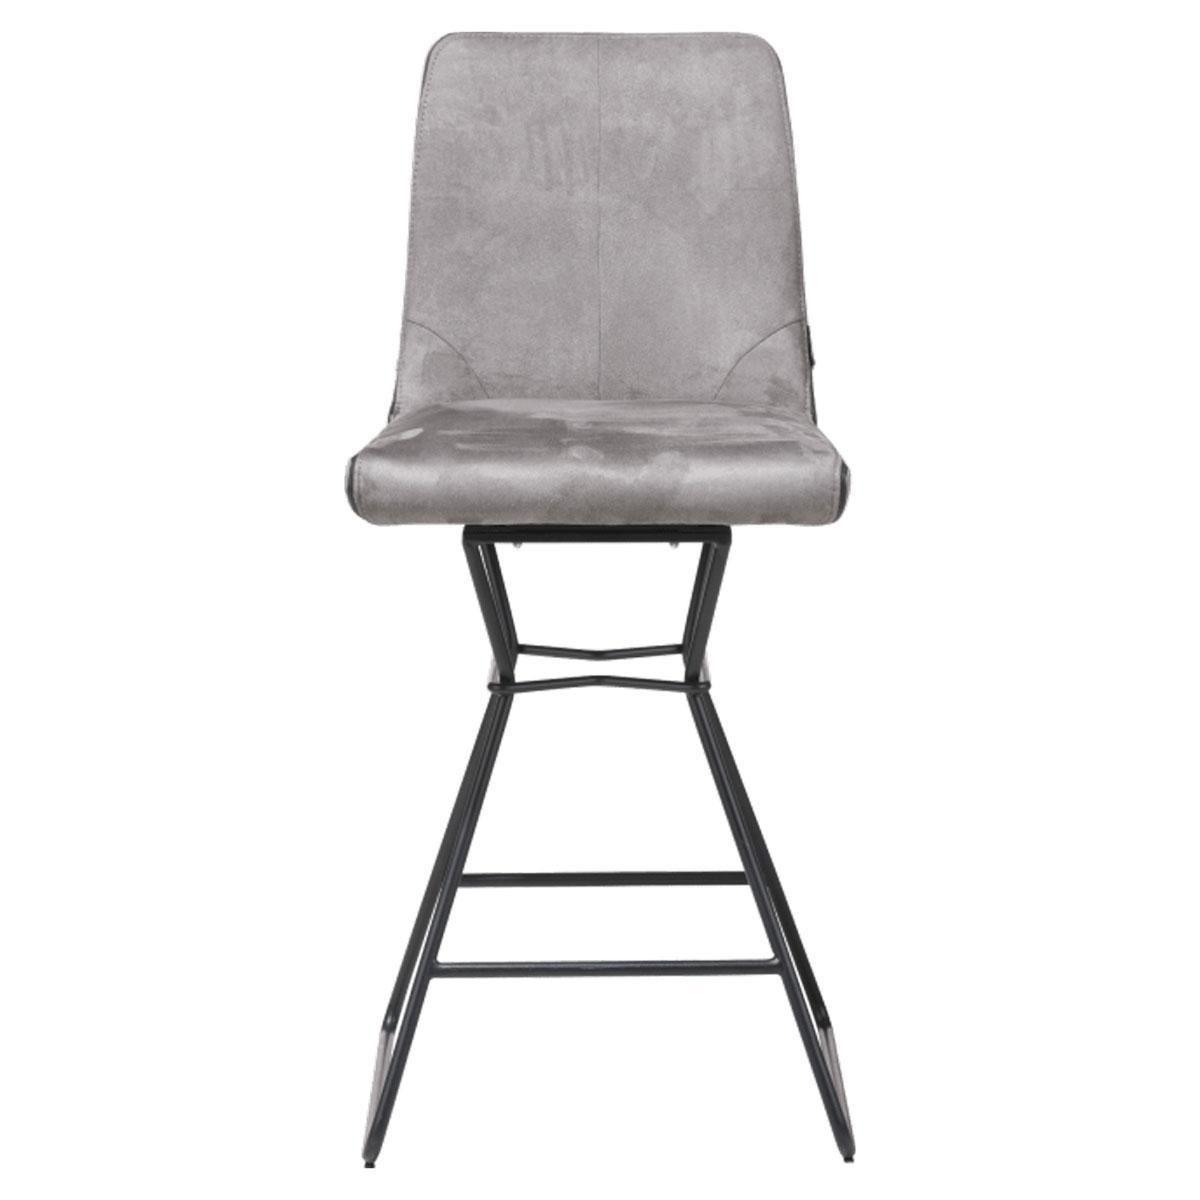 Chaise de bar AIDEN Xooon brun charcoal